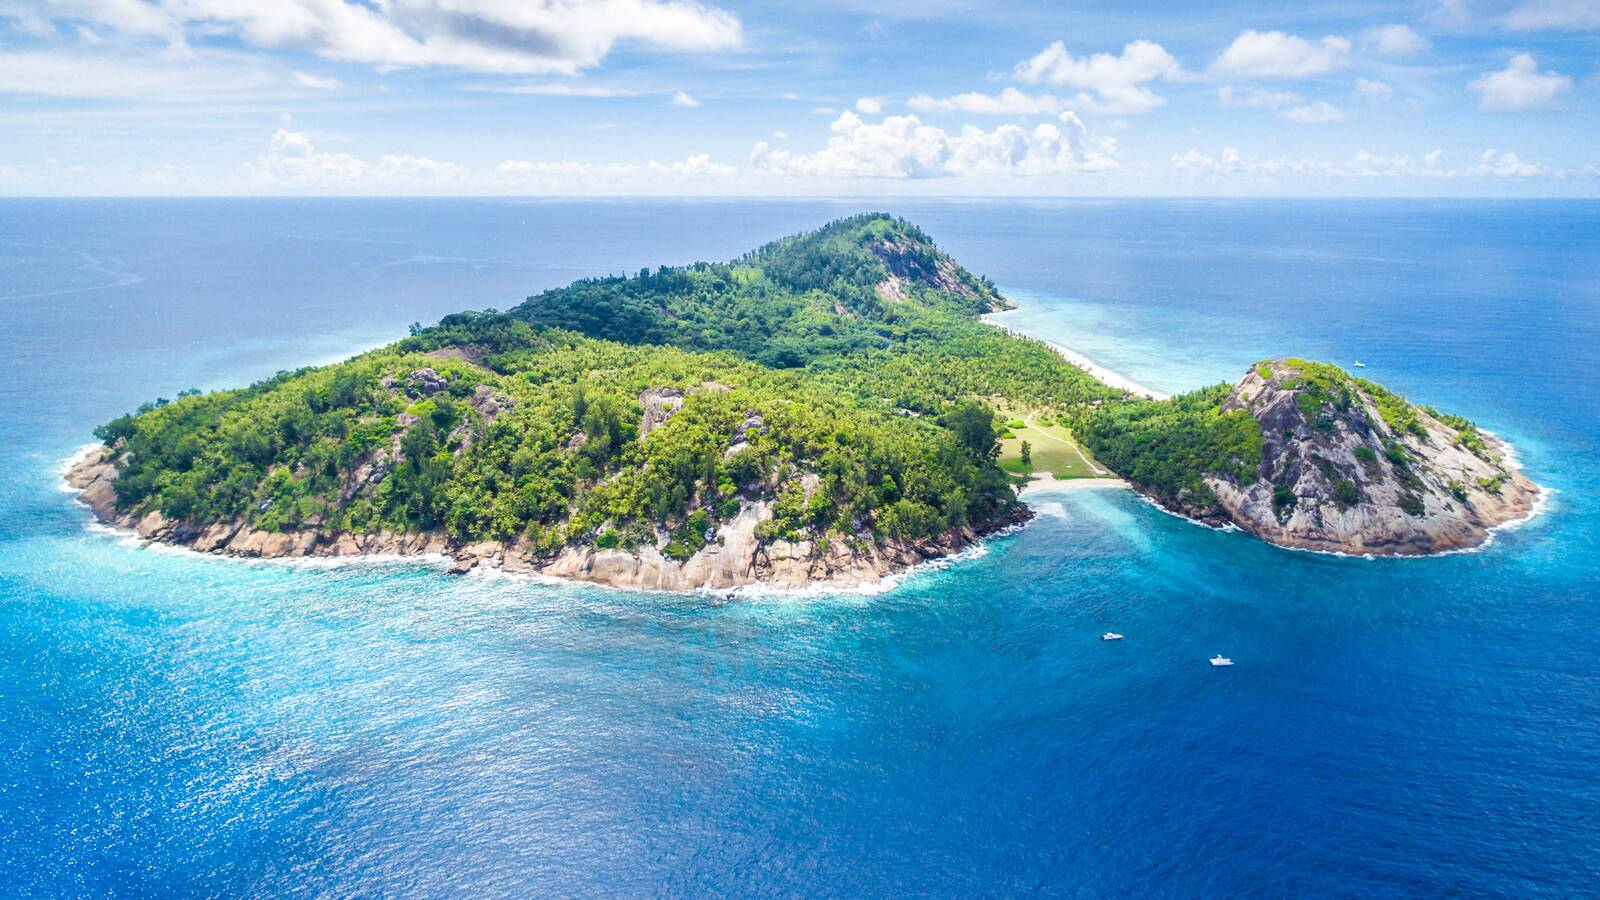 North Island View Seychelles